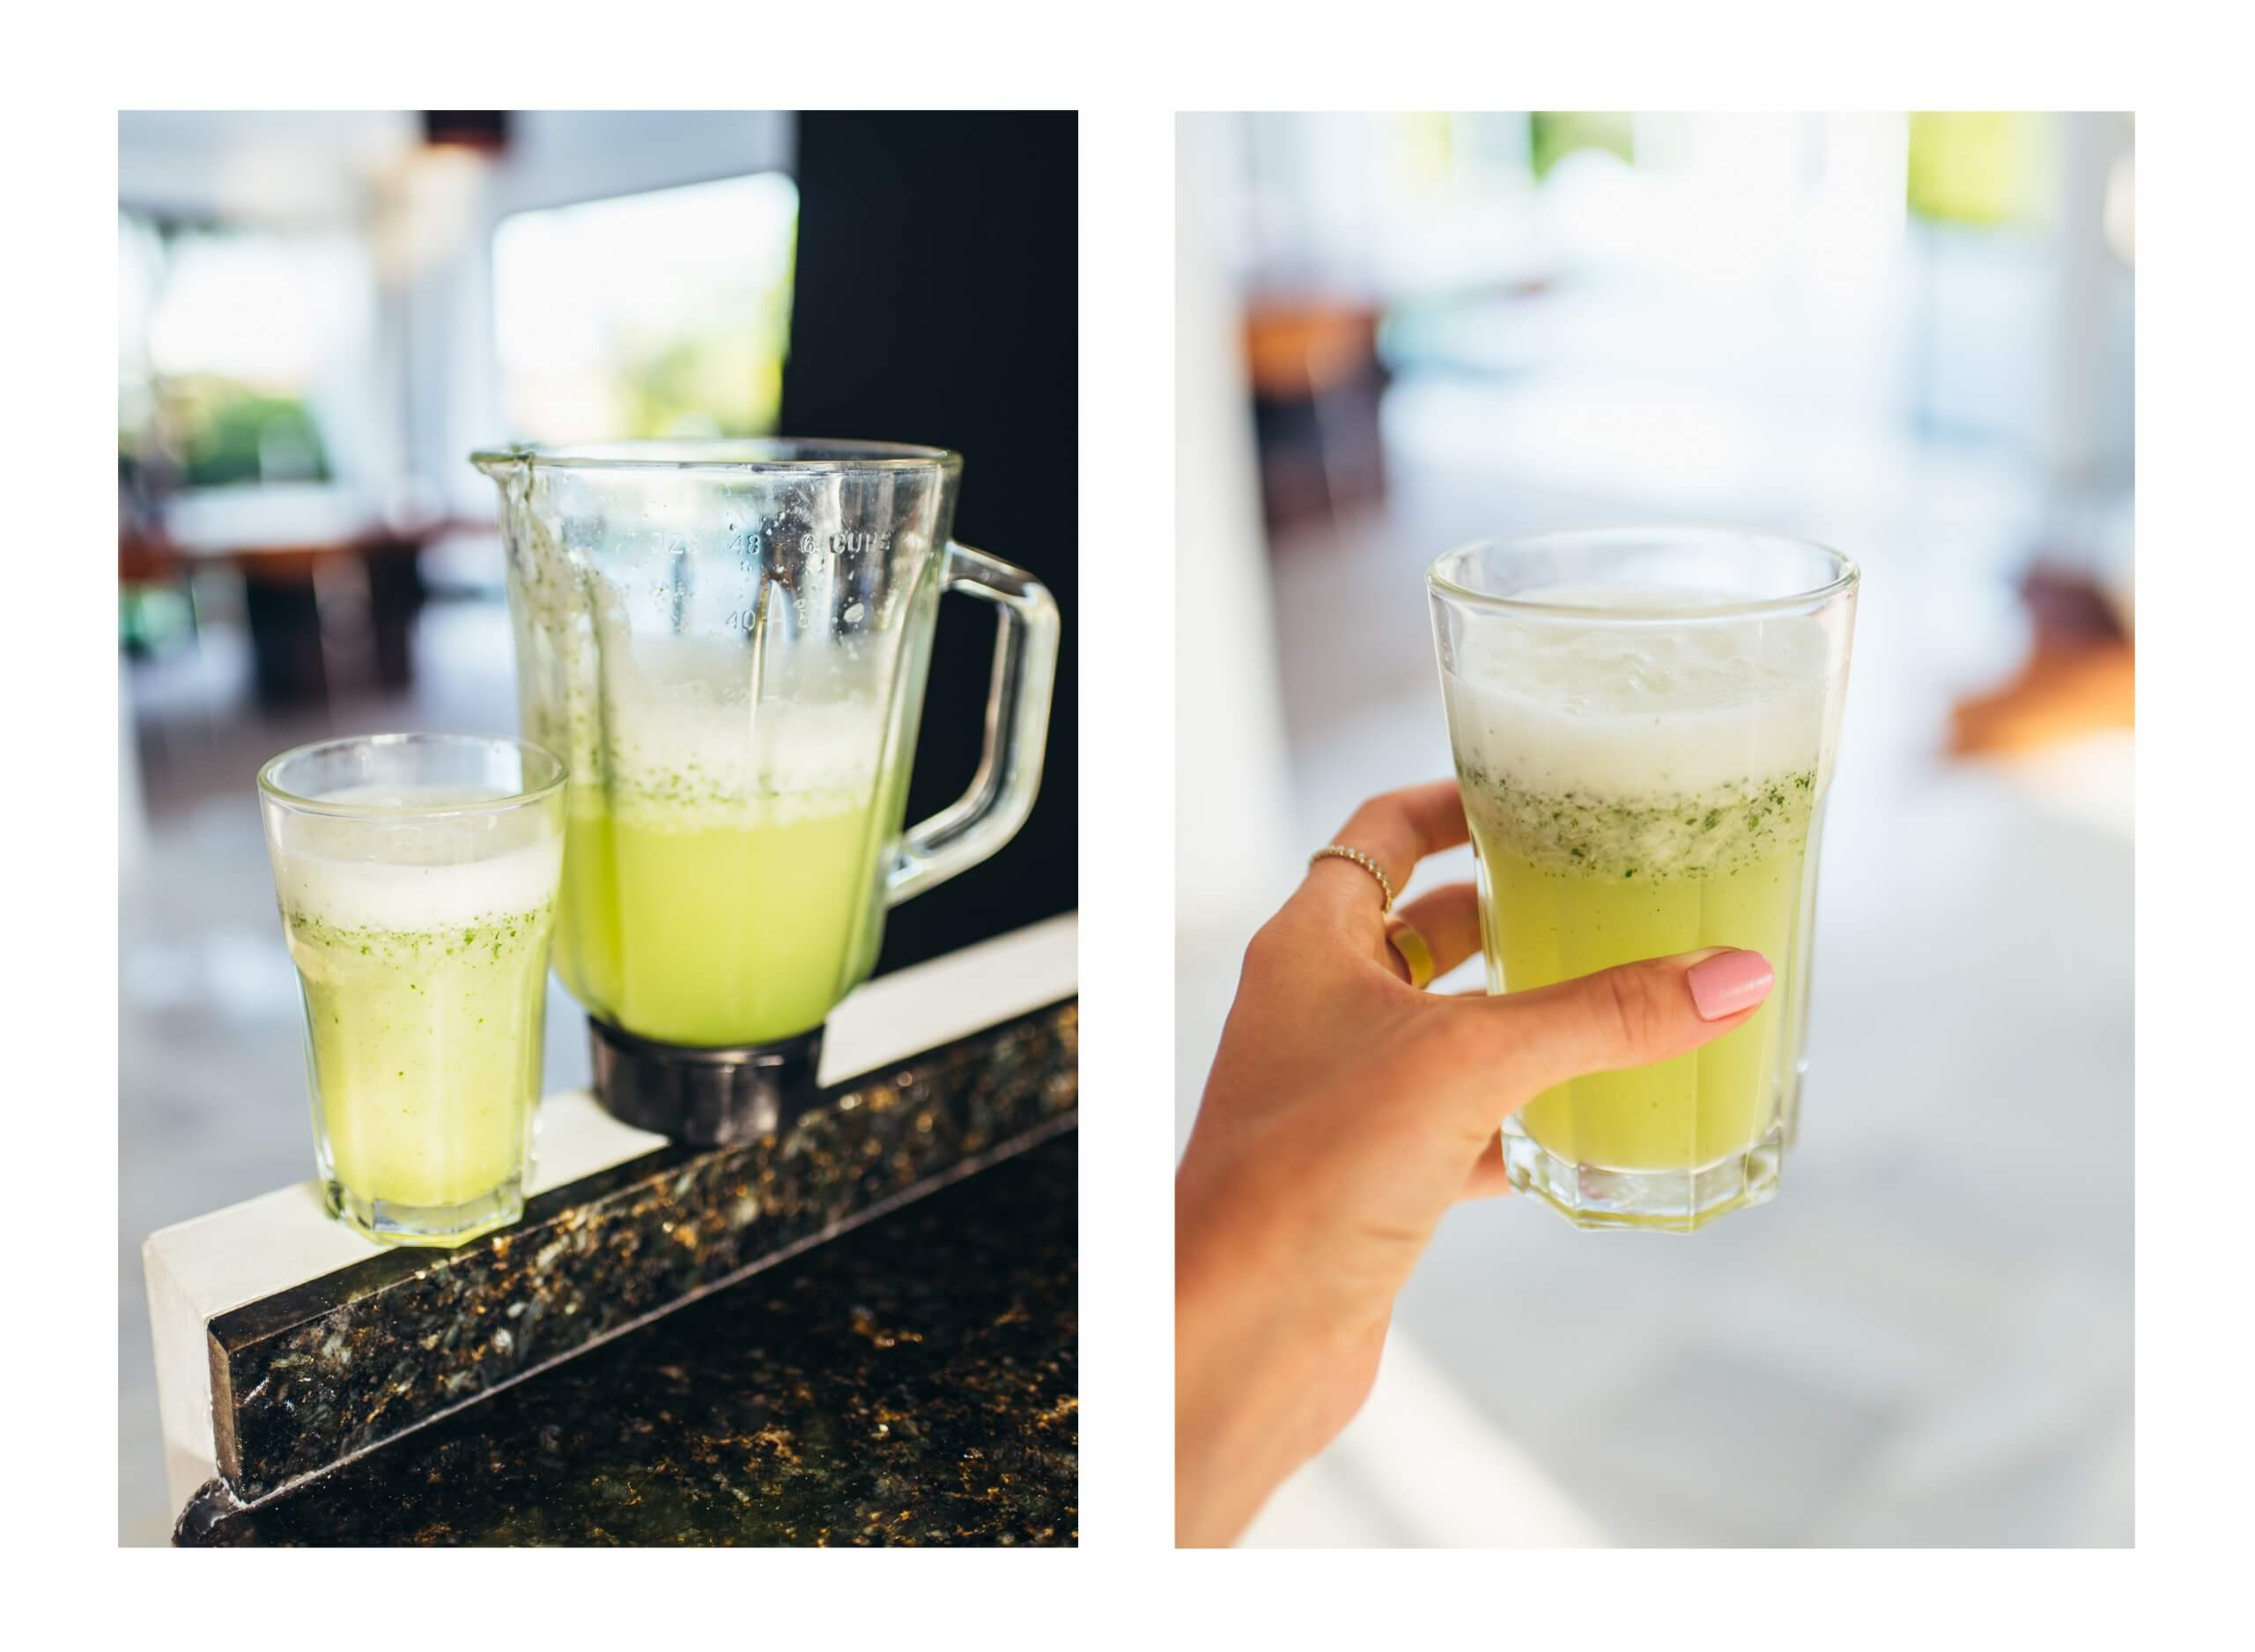 janni-deler-lemon-mint-drinkDSC_8573 copy